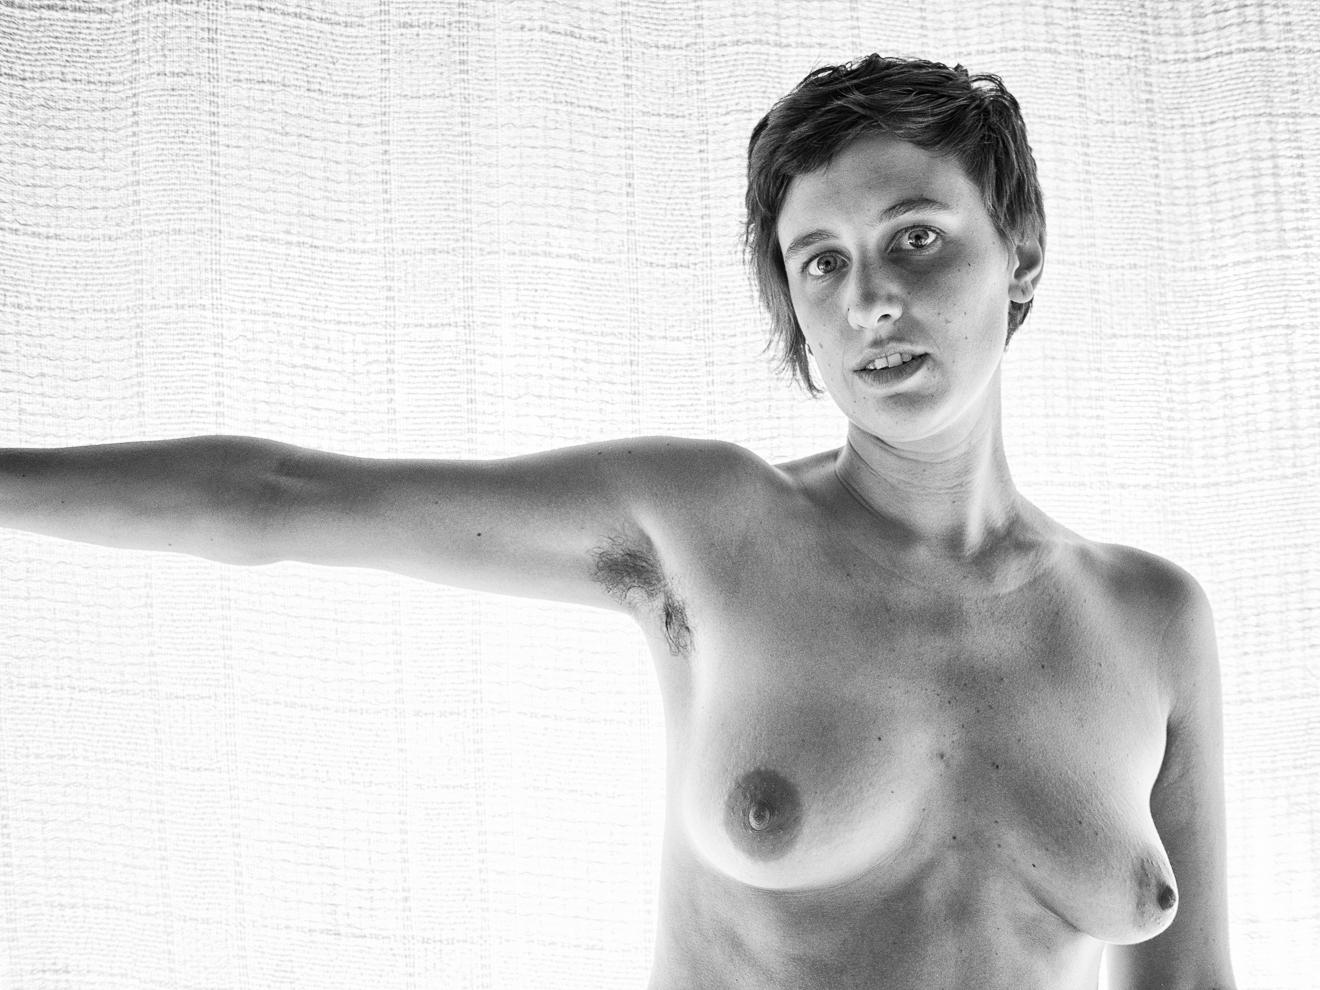 Audrey_B+W Body-15.jpg